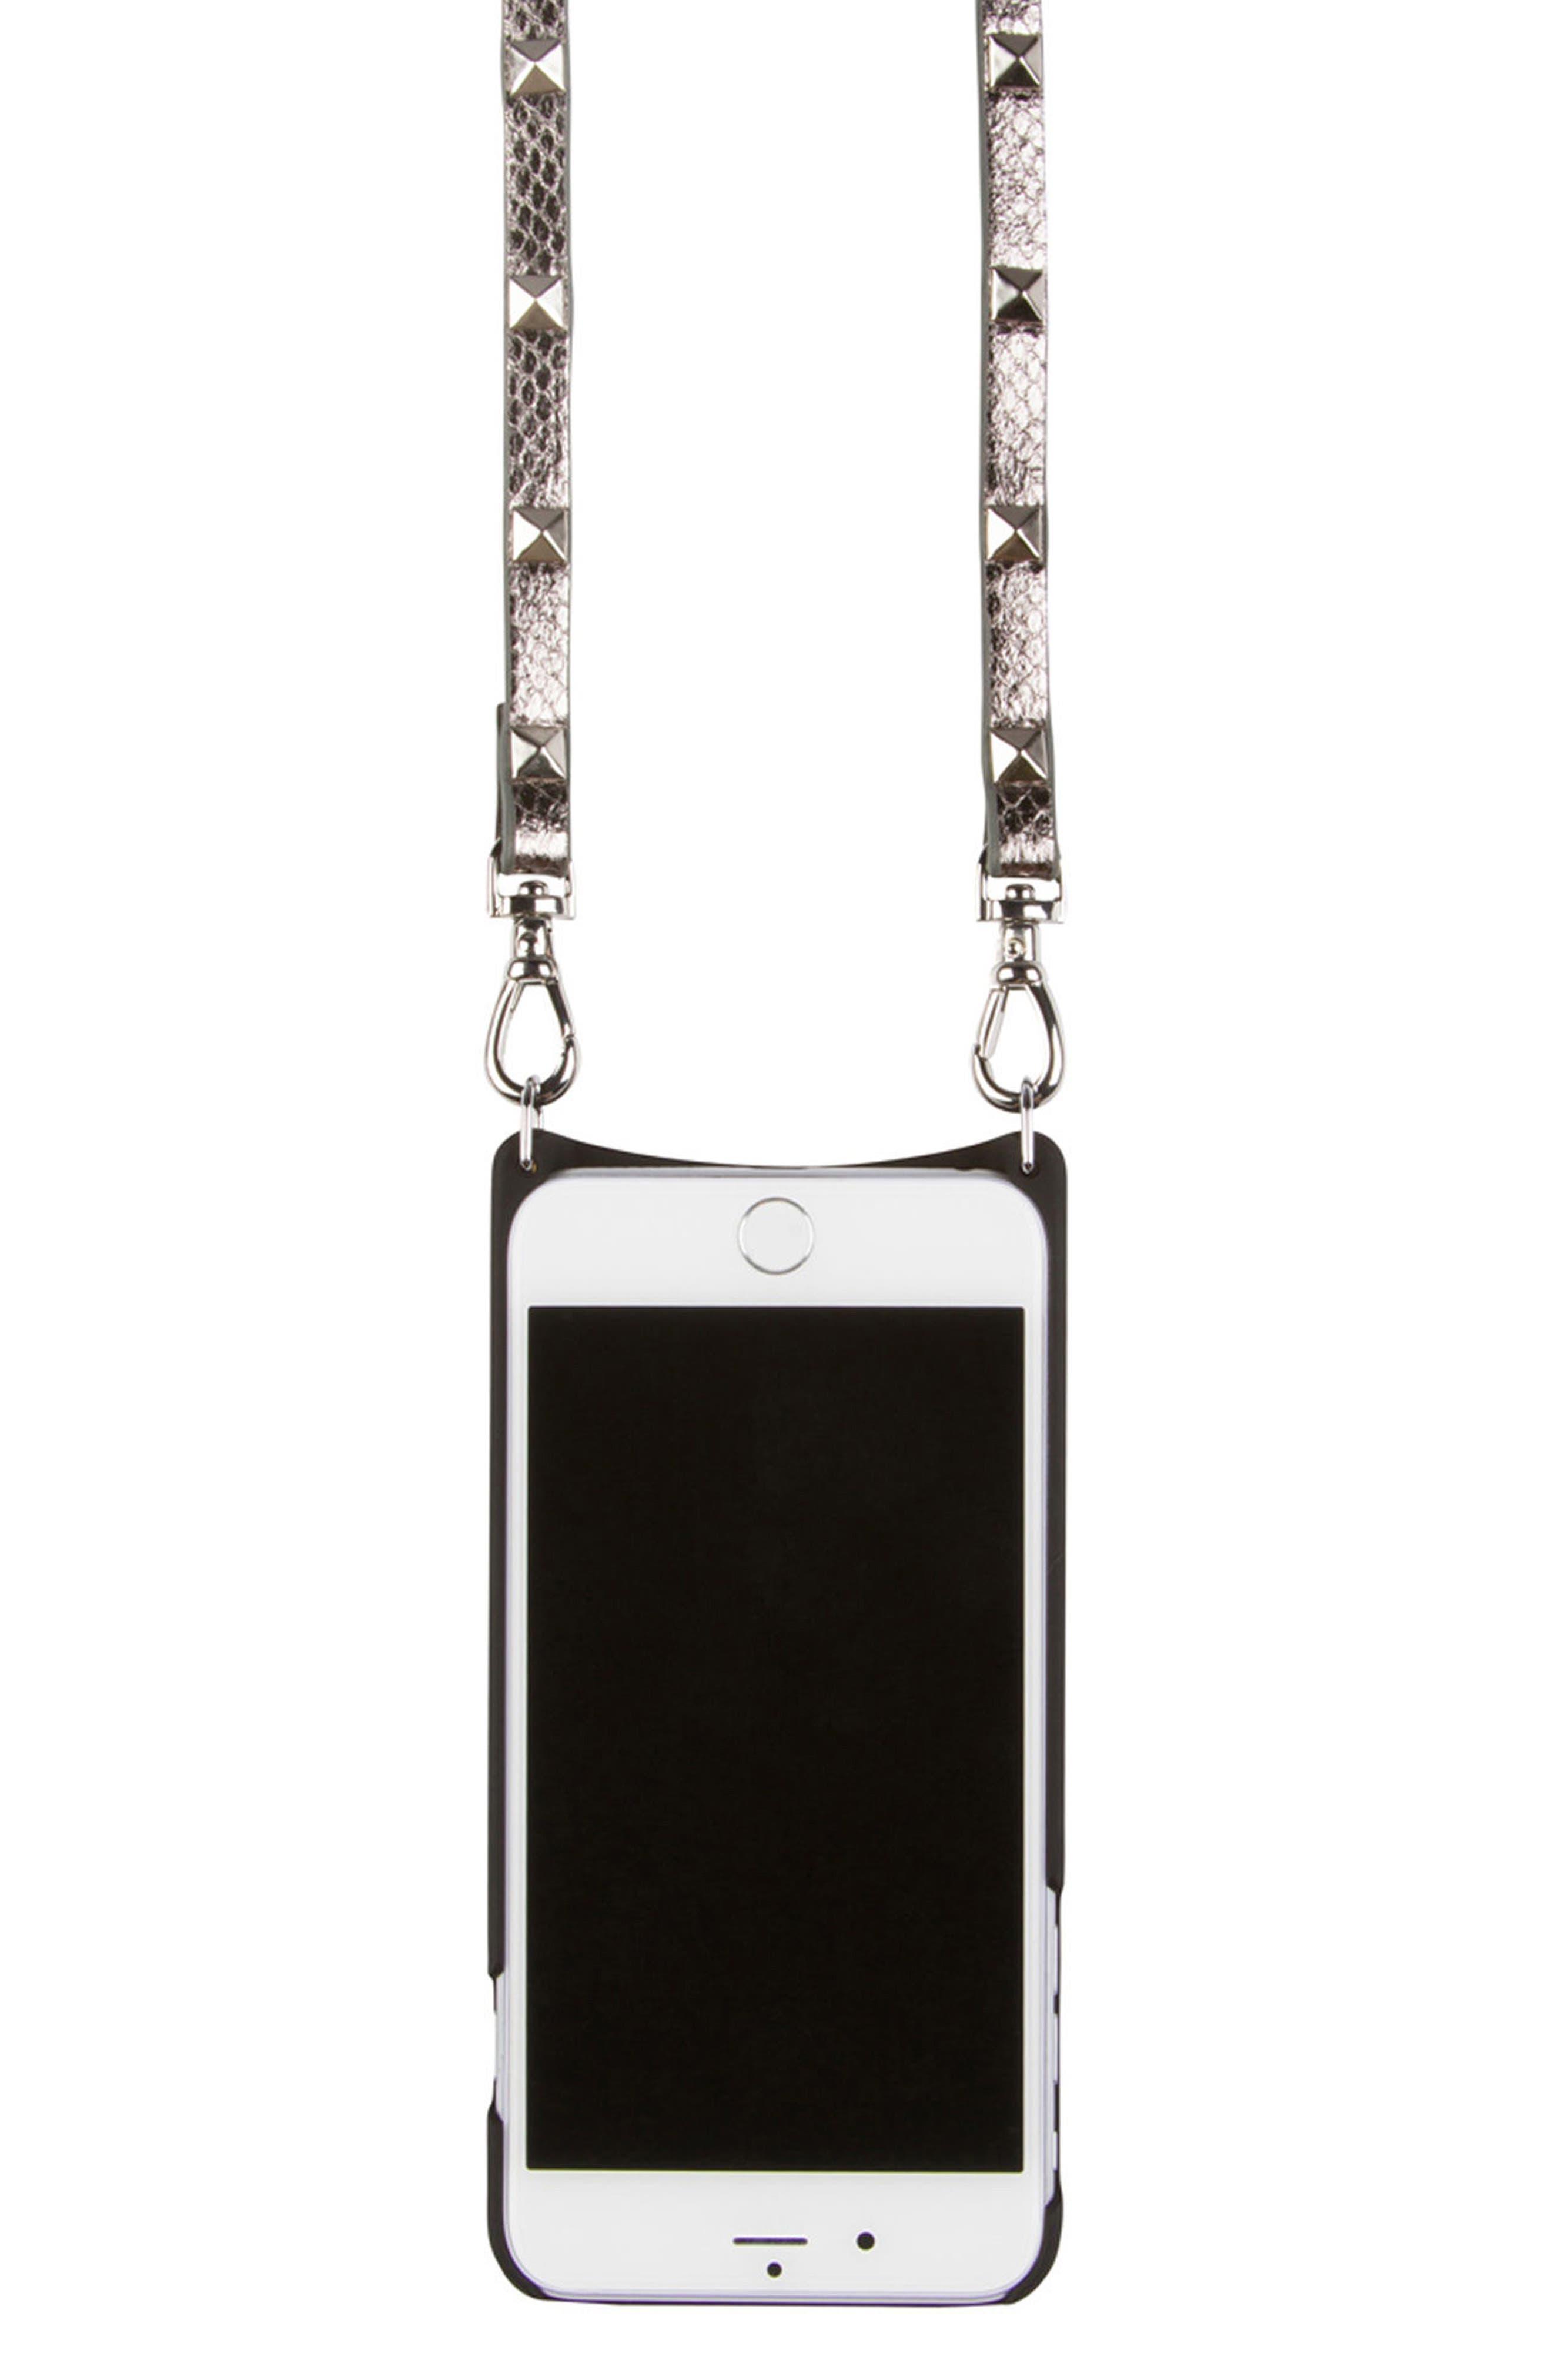 Sarah Metallic Faux Snakeskin iPhone 6/7/8 & 6/7/8 Plus Crossbody Case,                             Alternate thumbnail 4, color,                             PEWTER/ SILVER